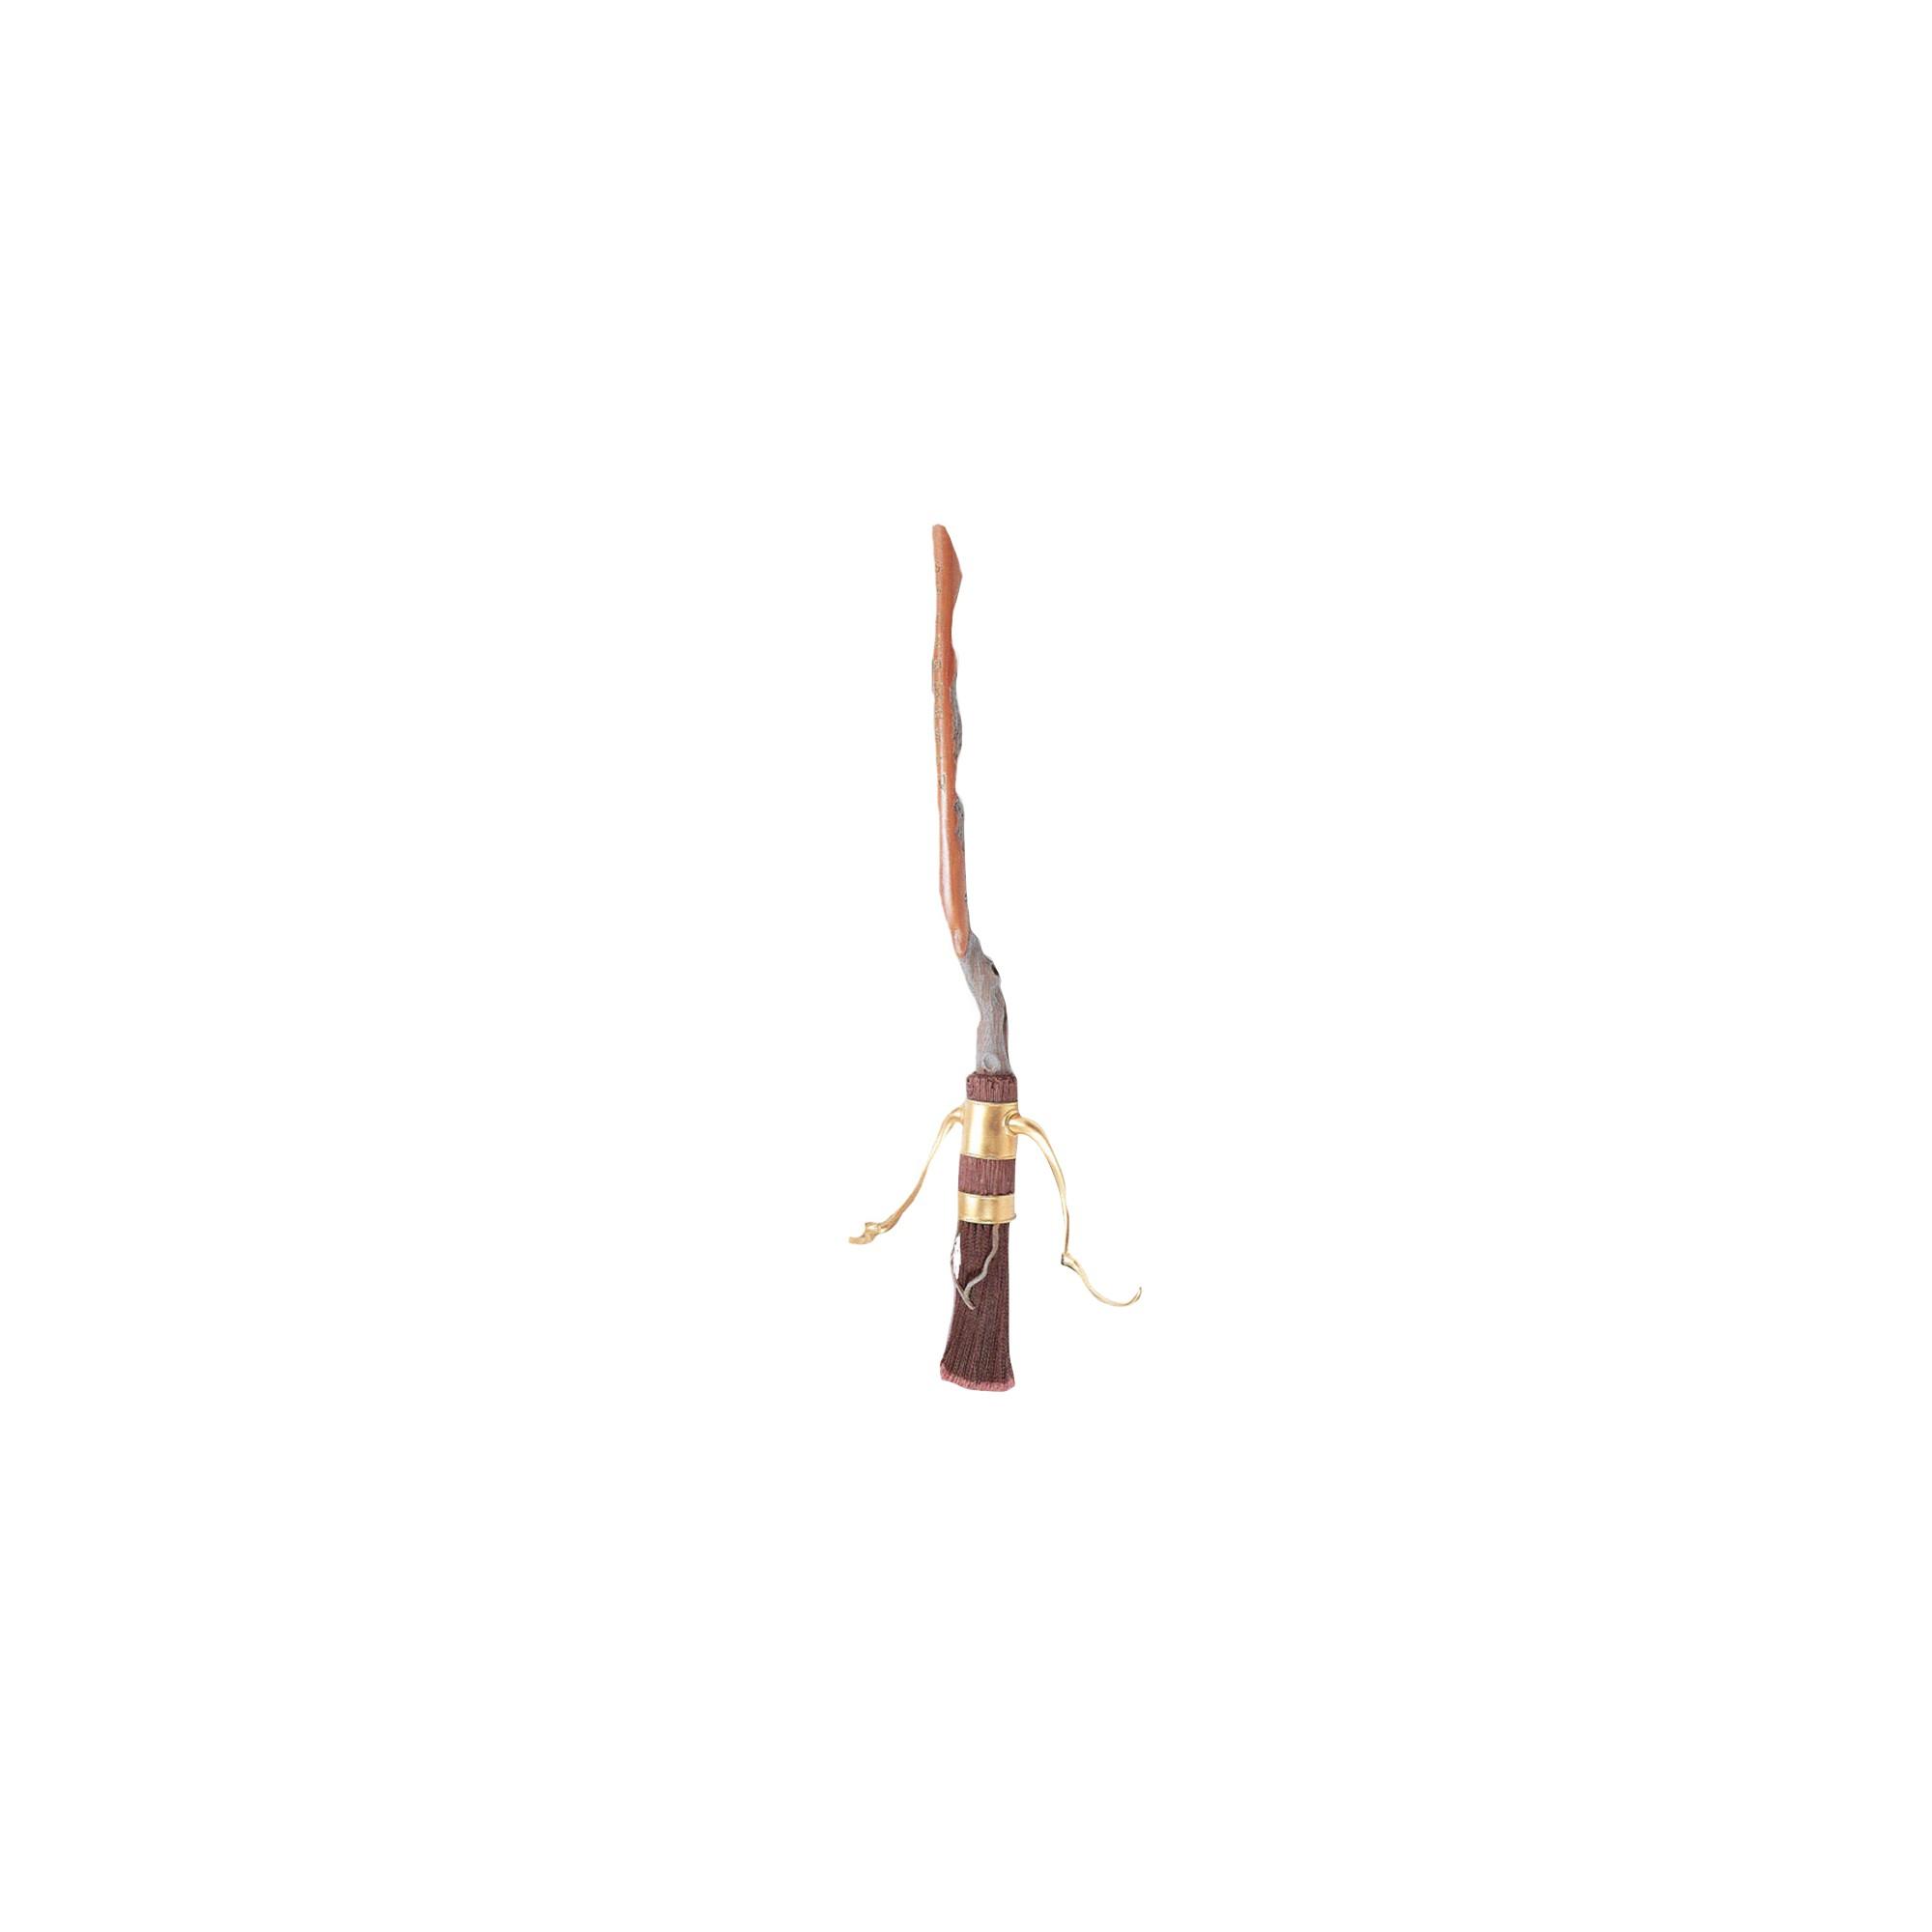 Halloween Harry Potter Standard Broom Costume Accessory, Adult Unisex